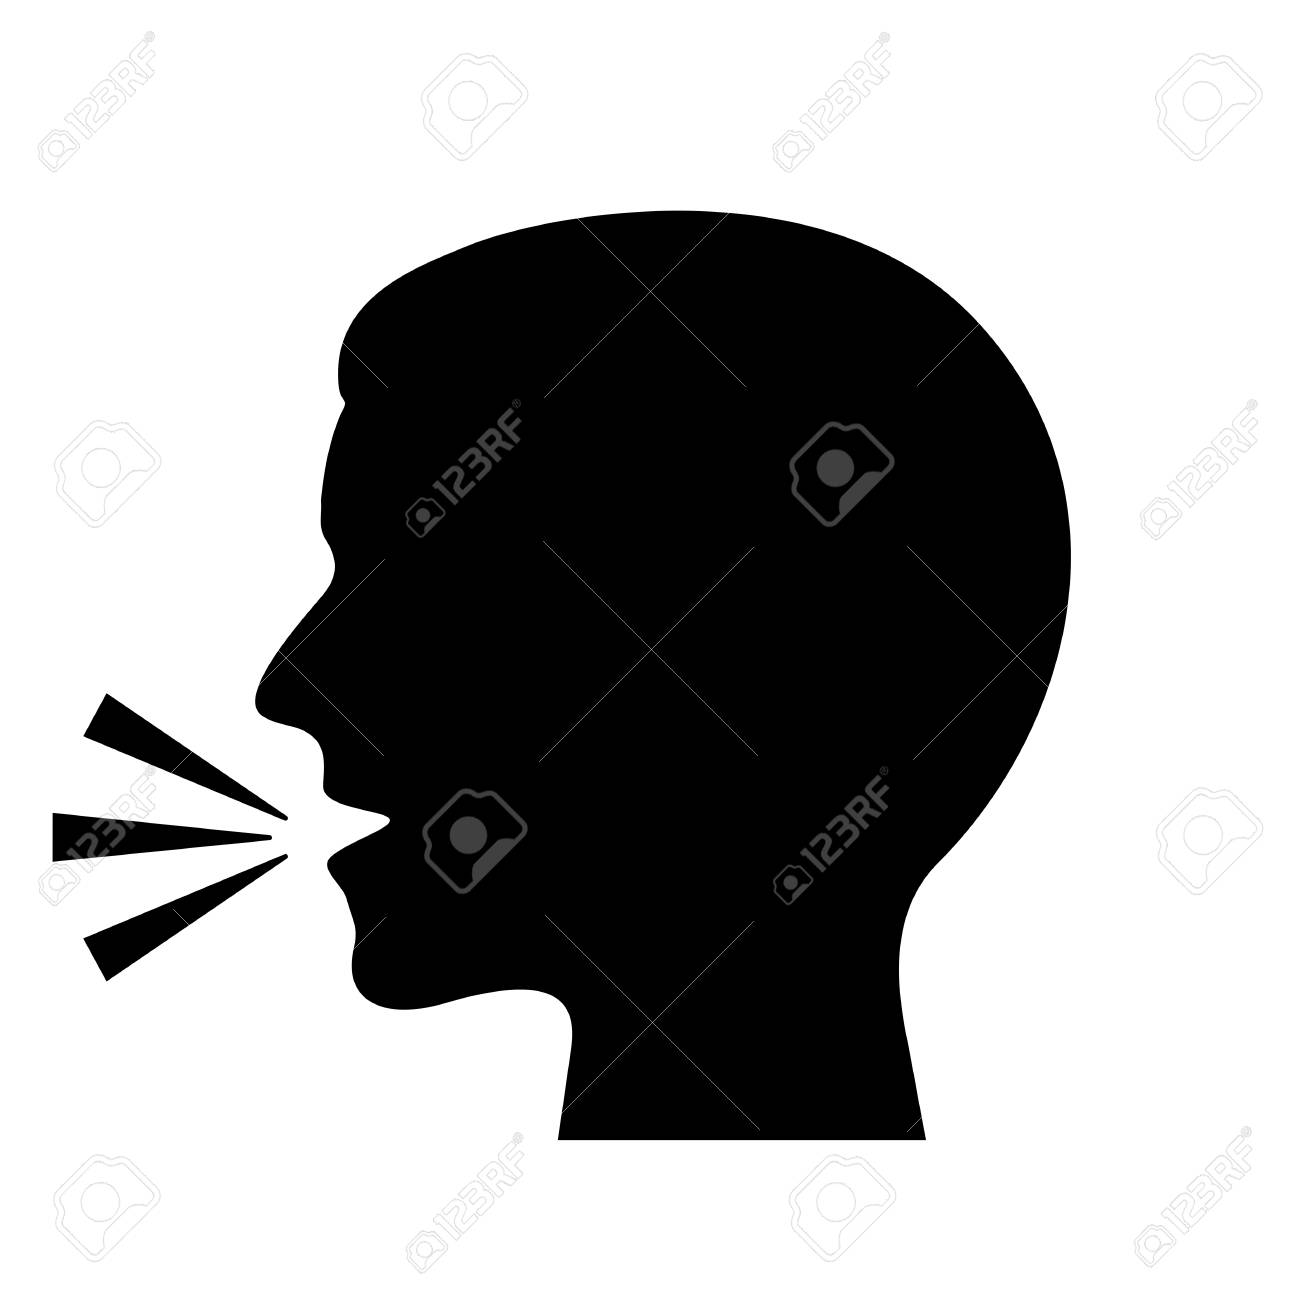 Man speaking vector silhouette - 88501342